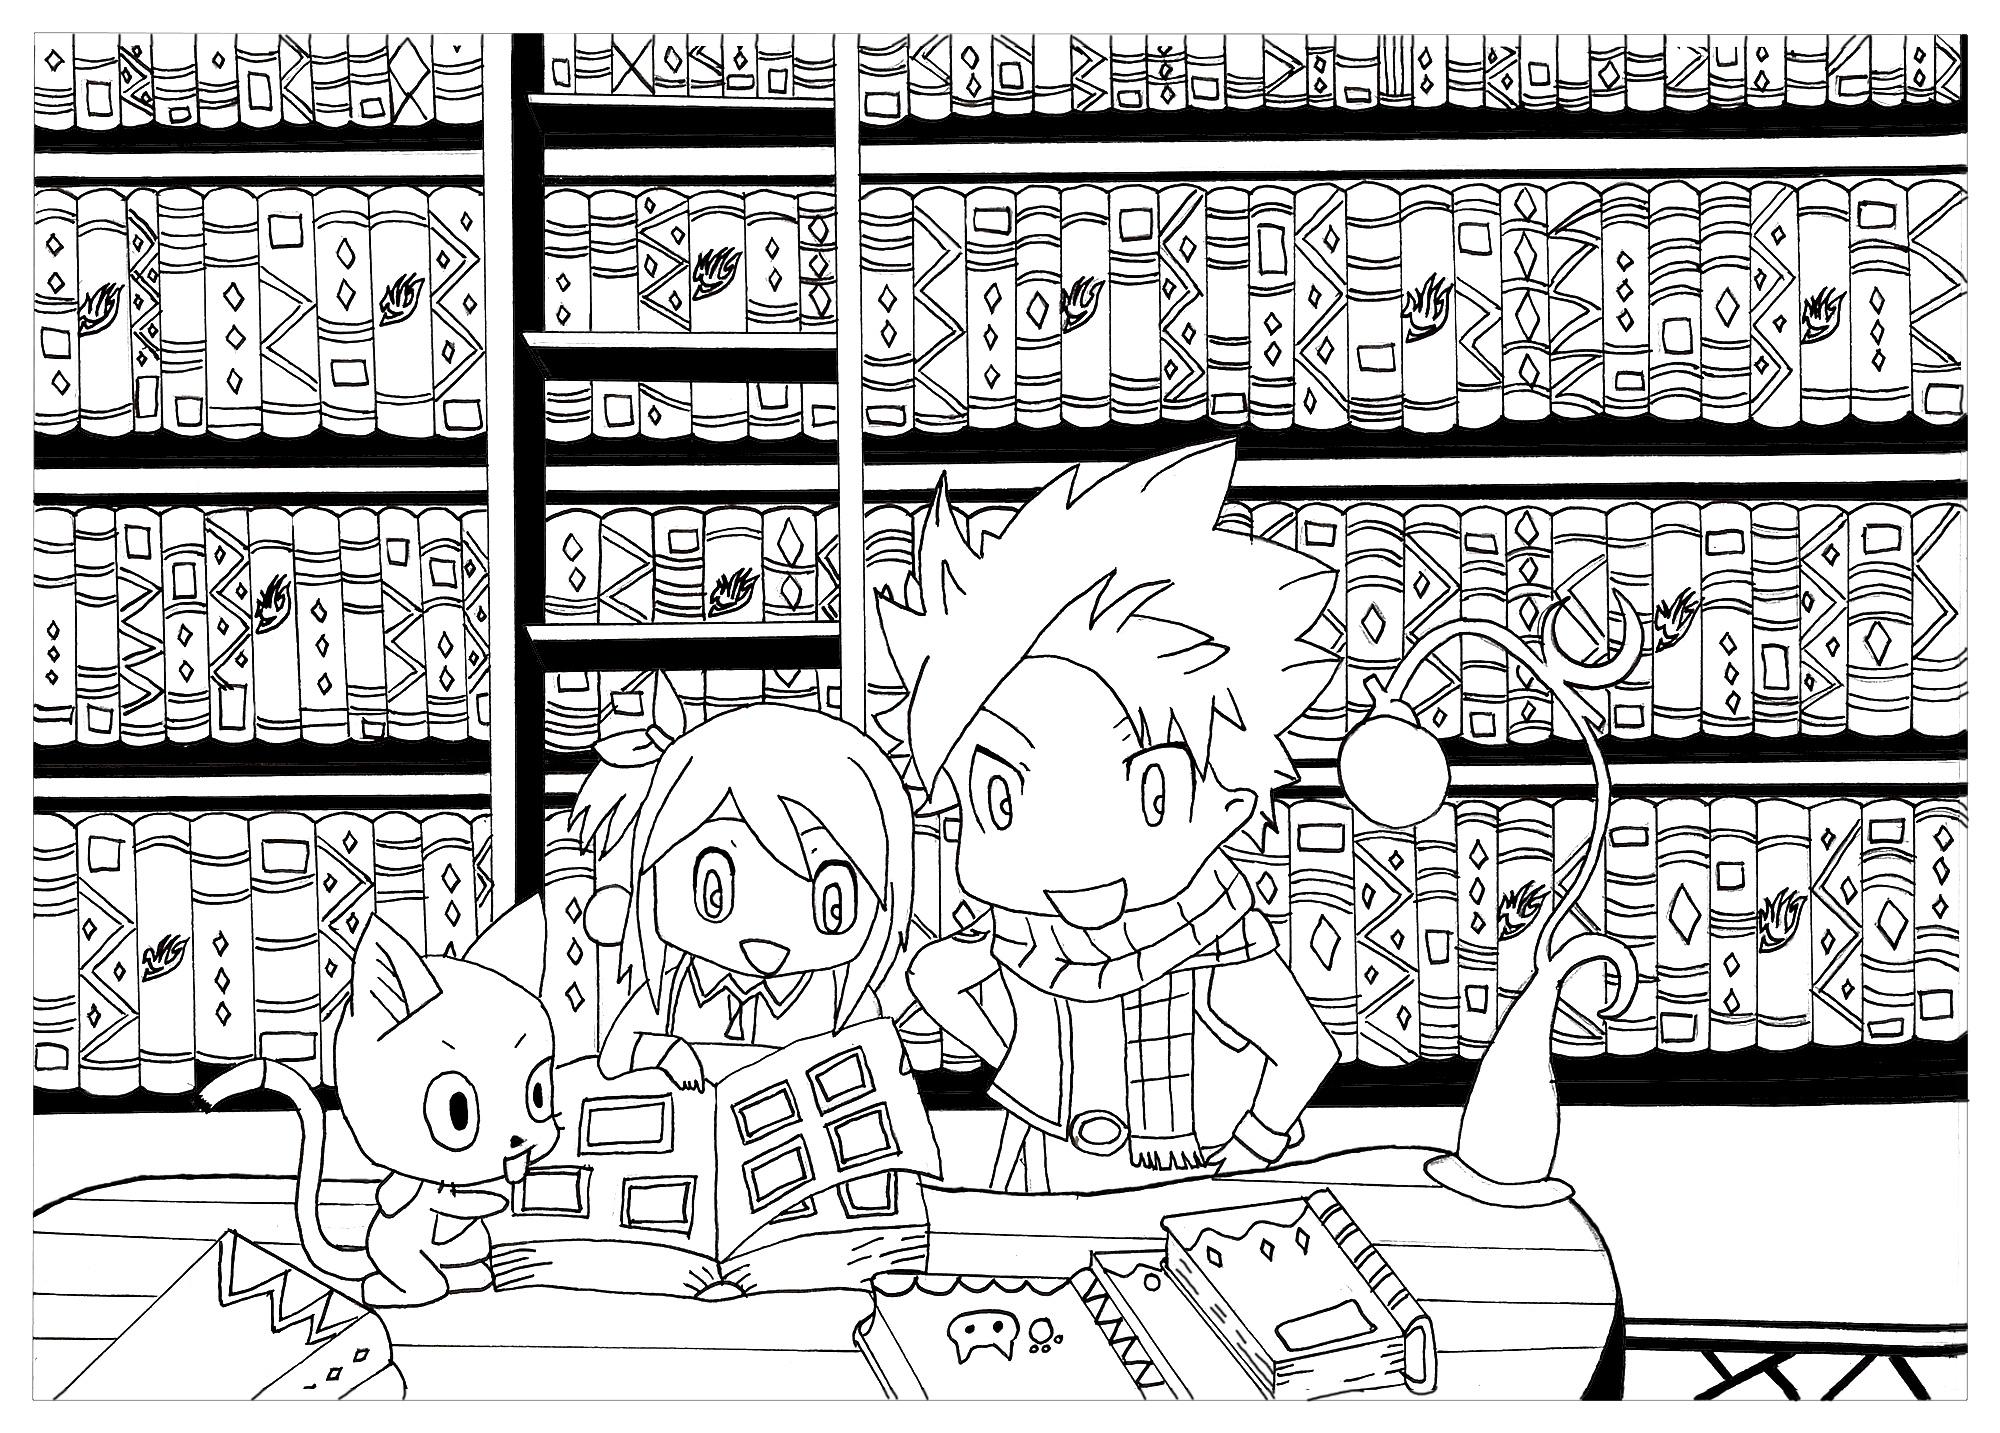 Mangas 19336 | Mangas - Colorear para adultos | JustColor